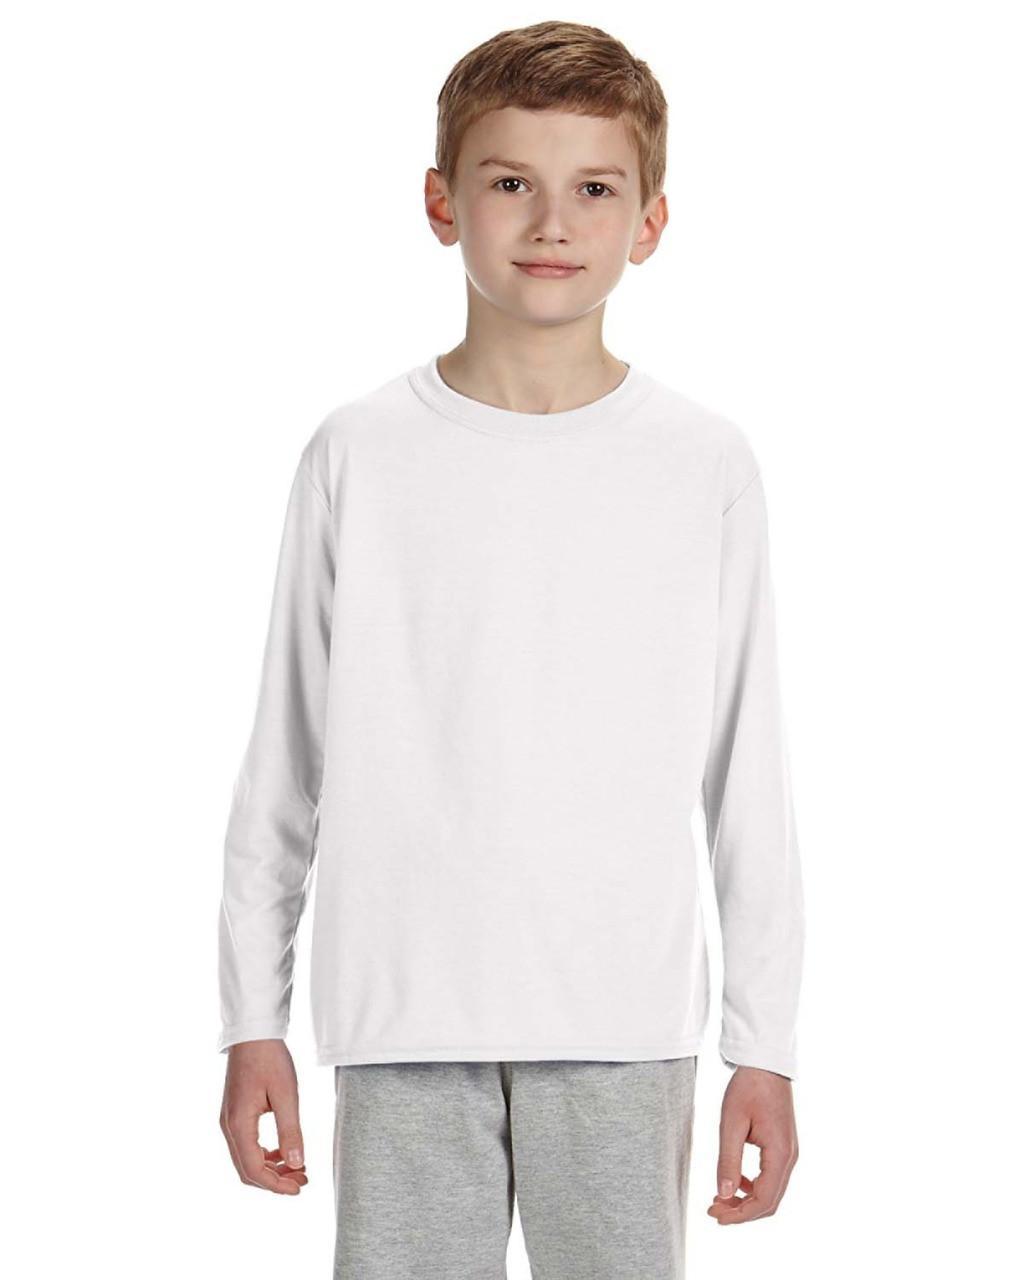 G240B Ultra Cotton Long-Sleeve T-Shirt Gildan Boys 6.1 oz -Light Blue -XL-12PK